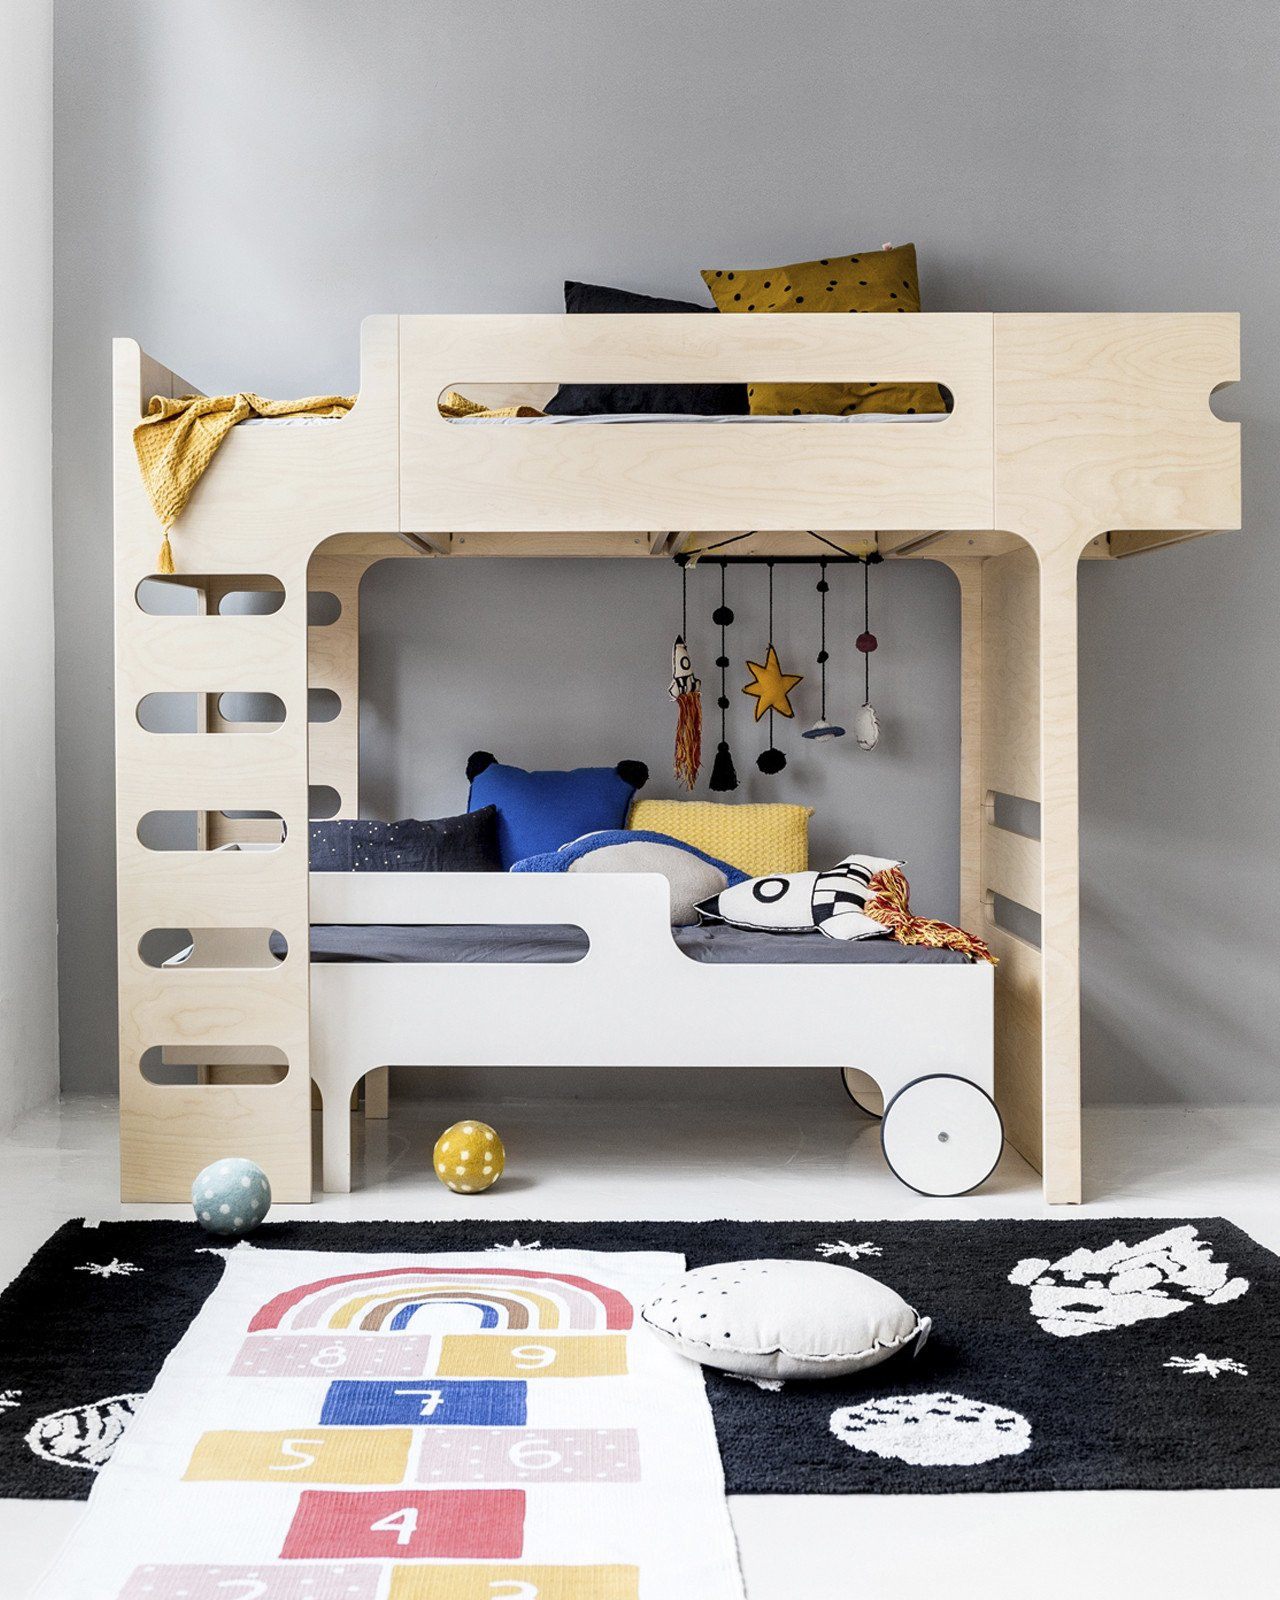 Cheap Childrens Bedroom Set Inspirational F&r Bed Set for 2 Kids